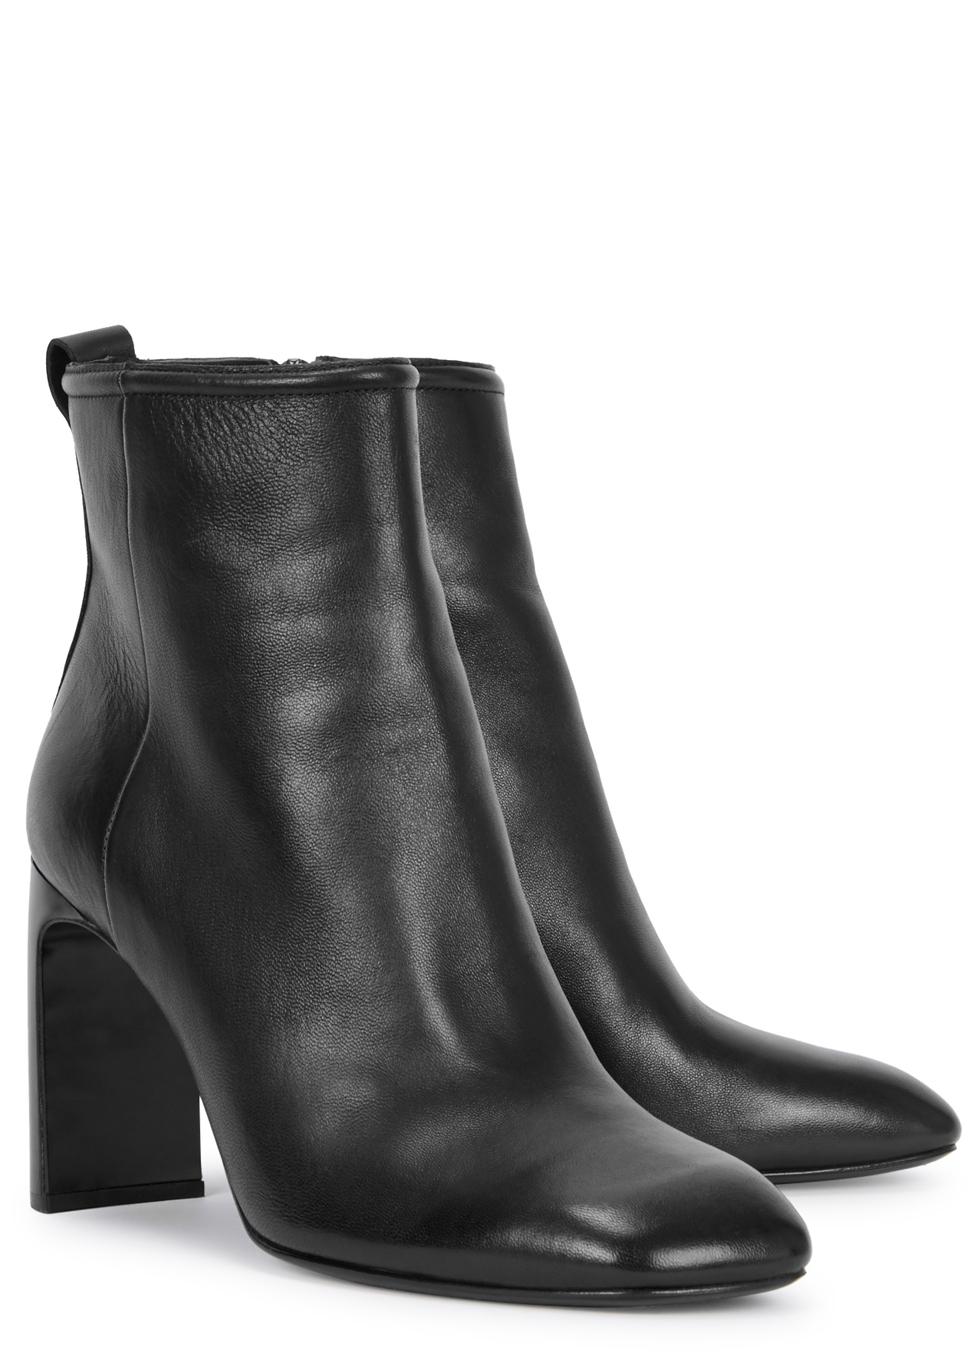 Ellis 90 leather ankle boots - rag & bone